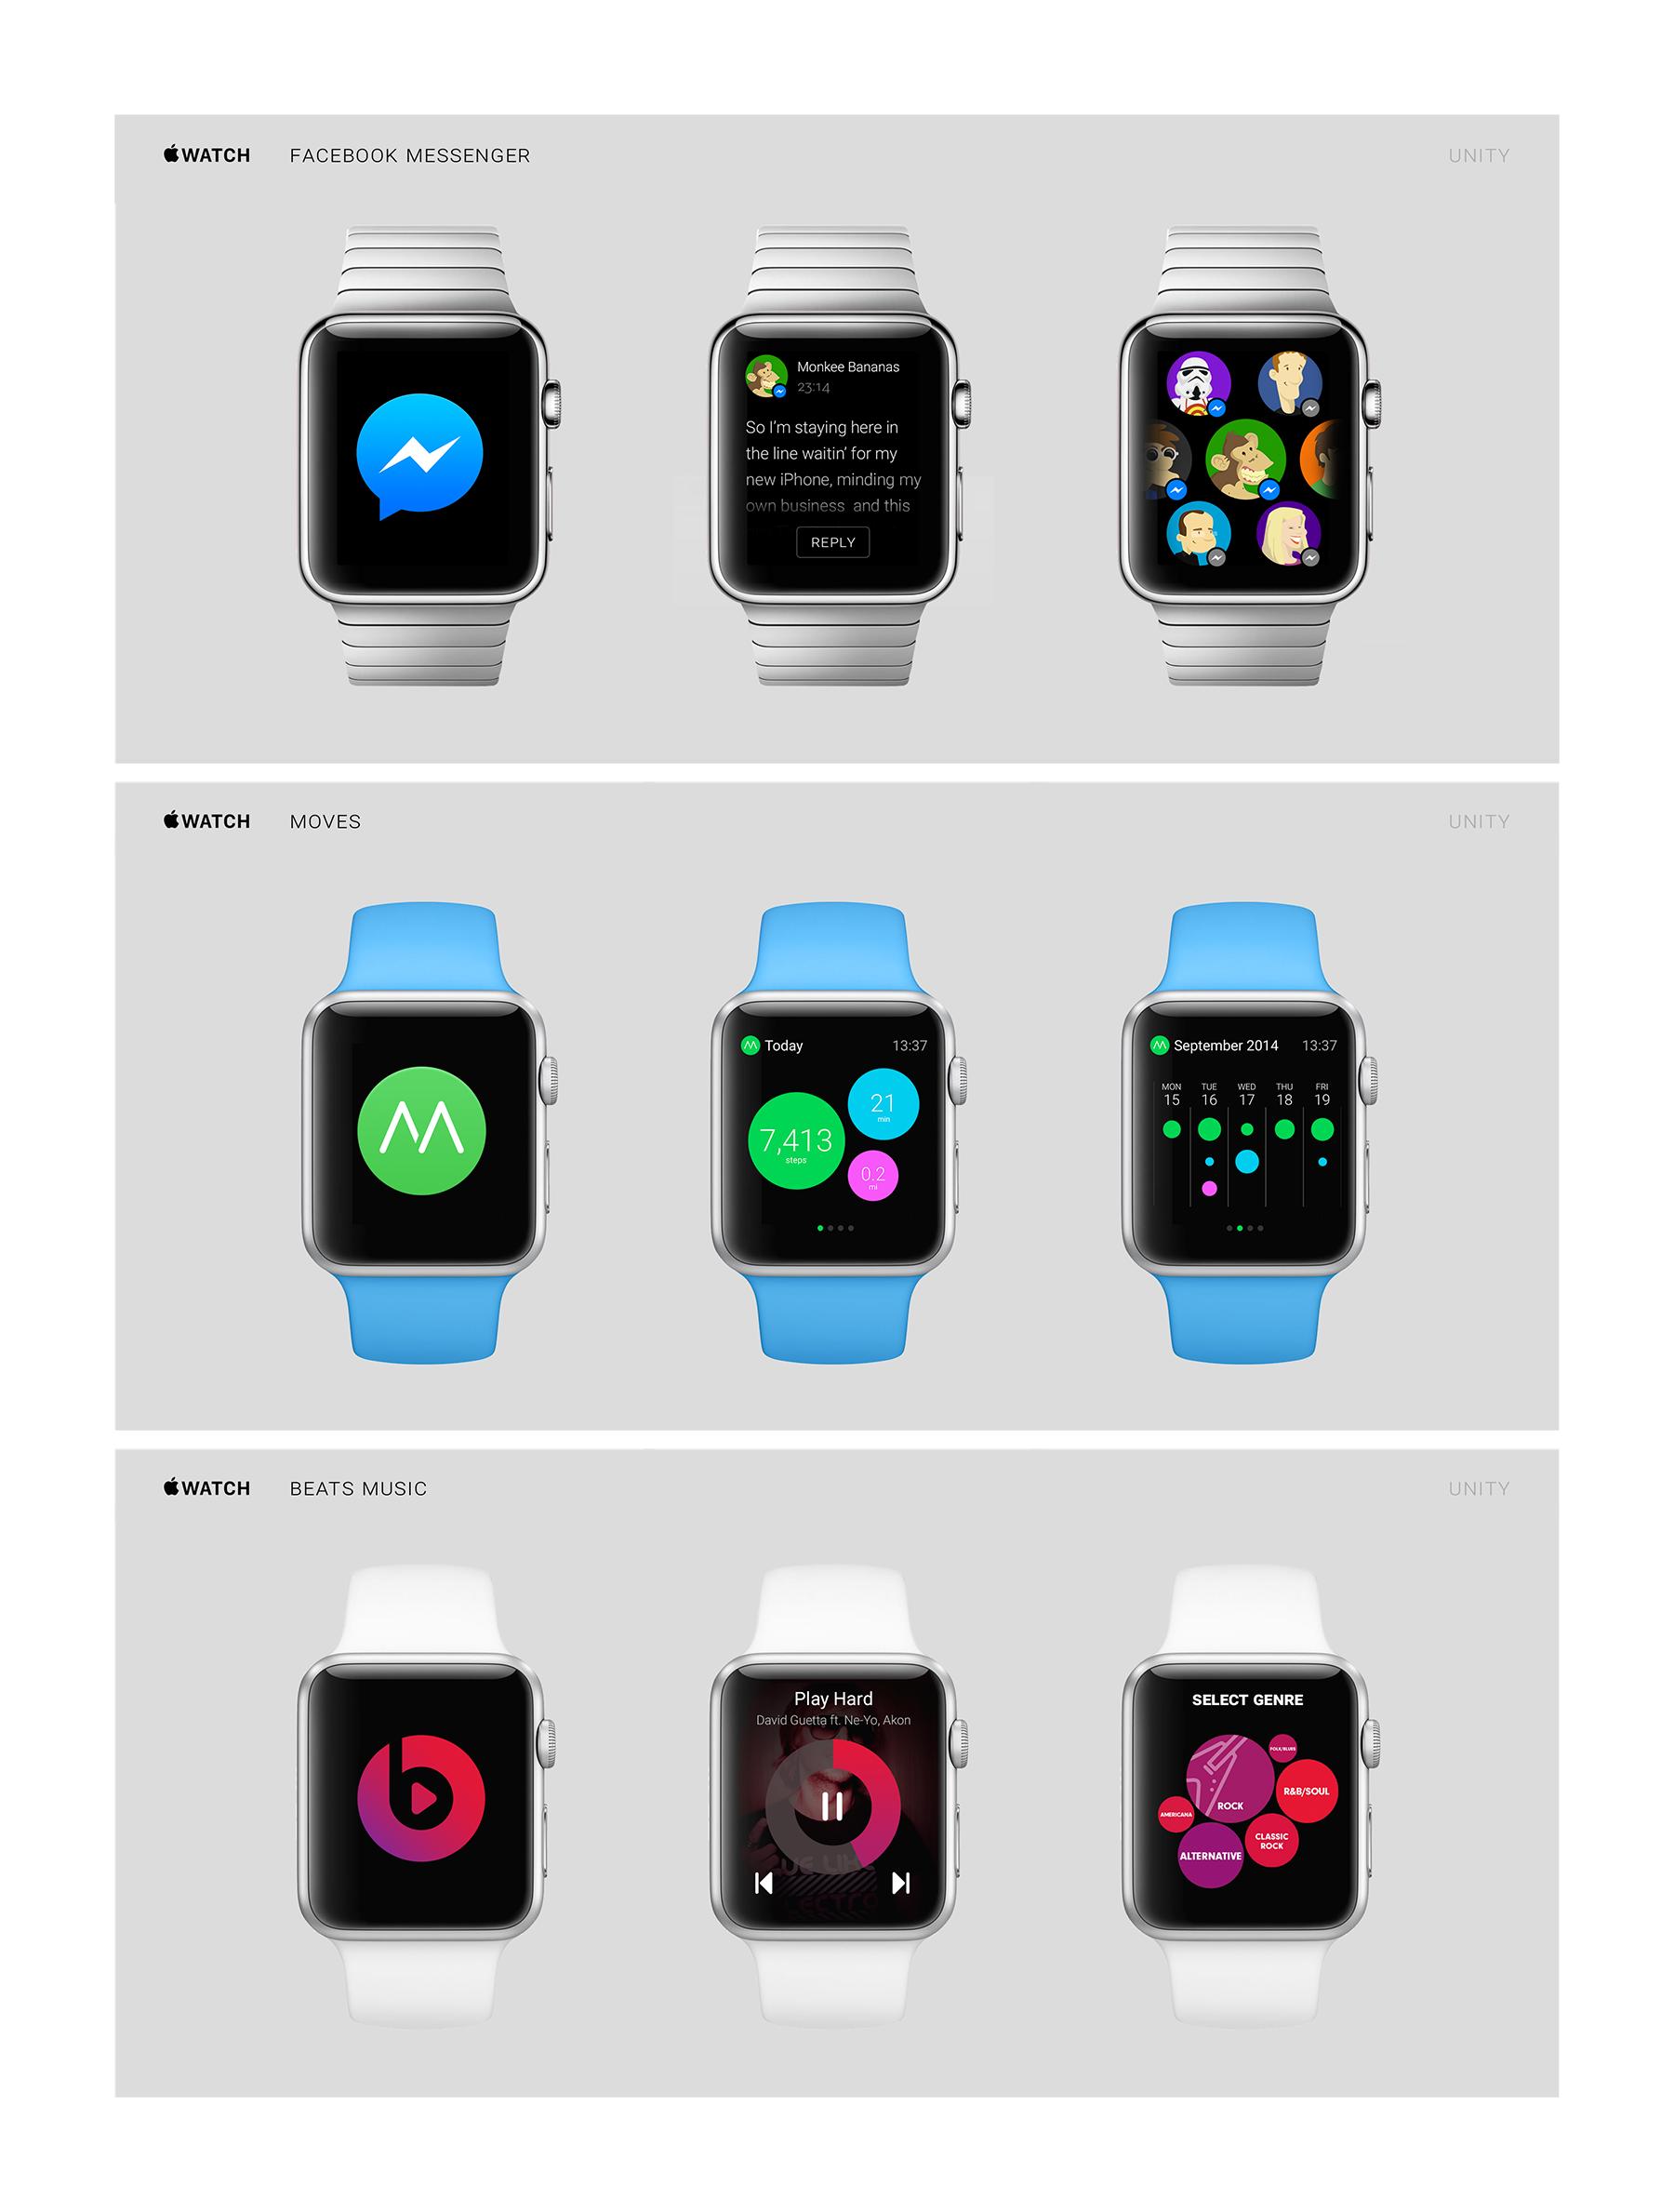 Apple Watch Concepts Facebook Messenger, Moves, Beats